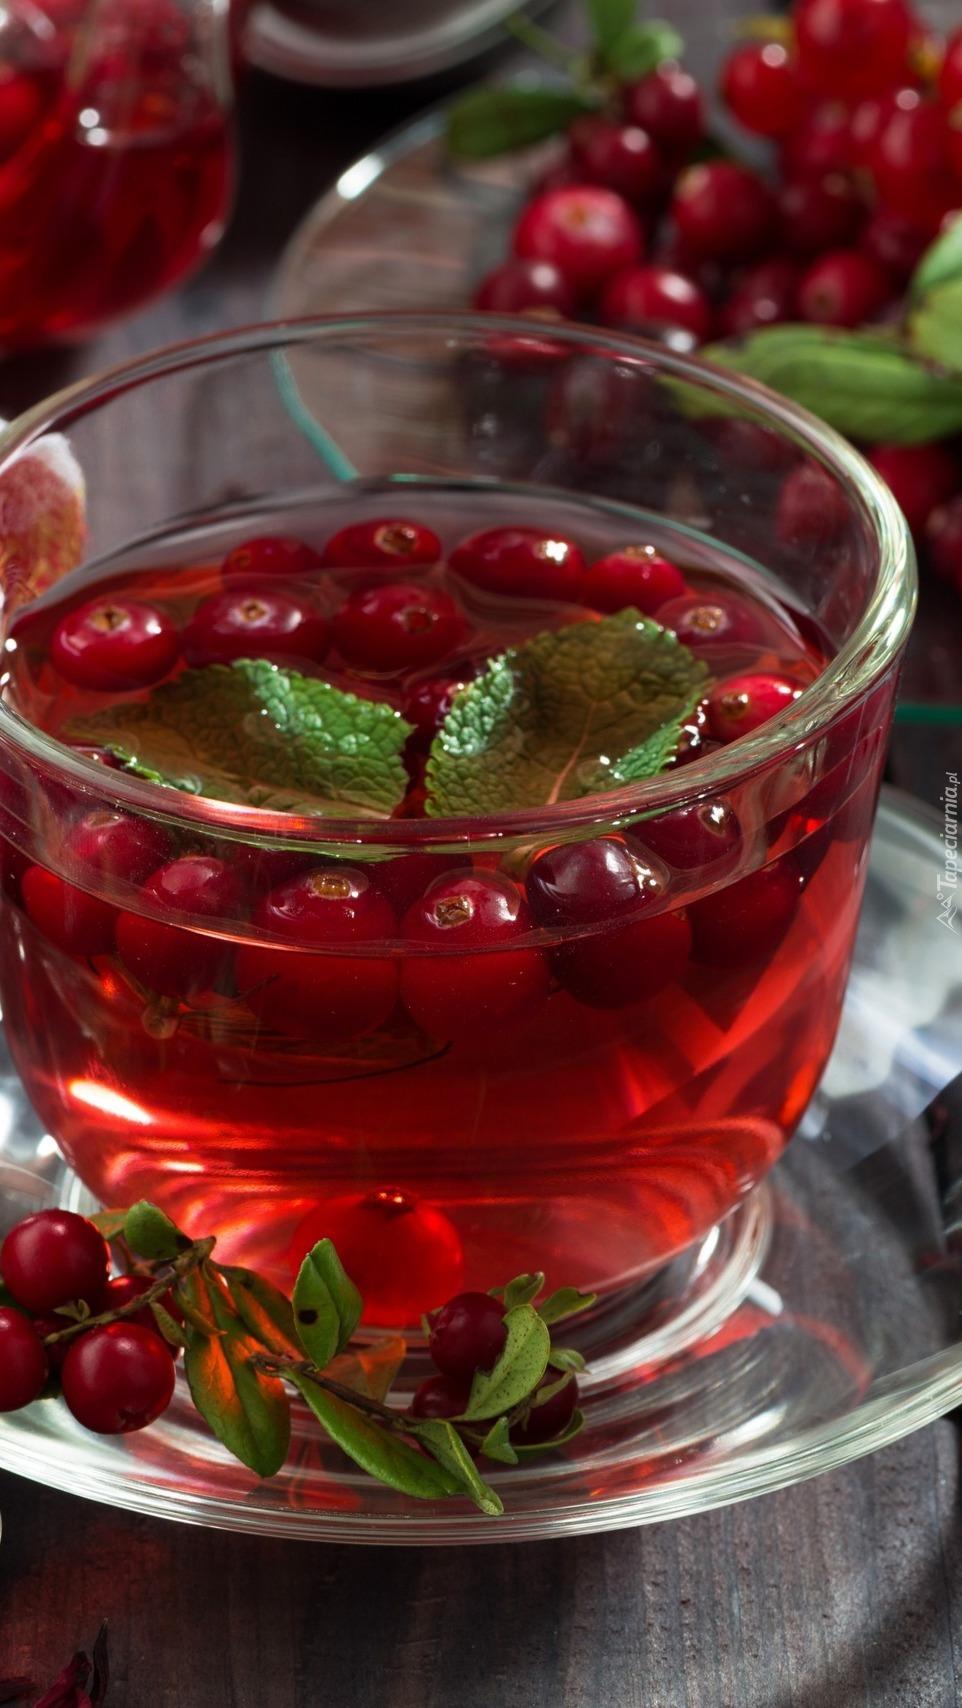 Herbata z żurawiną